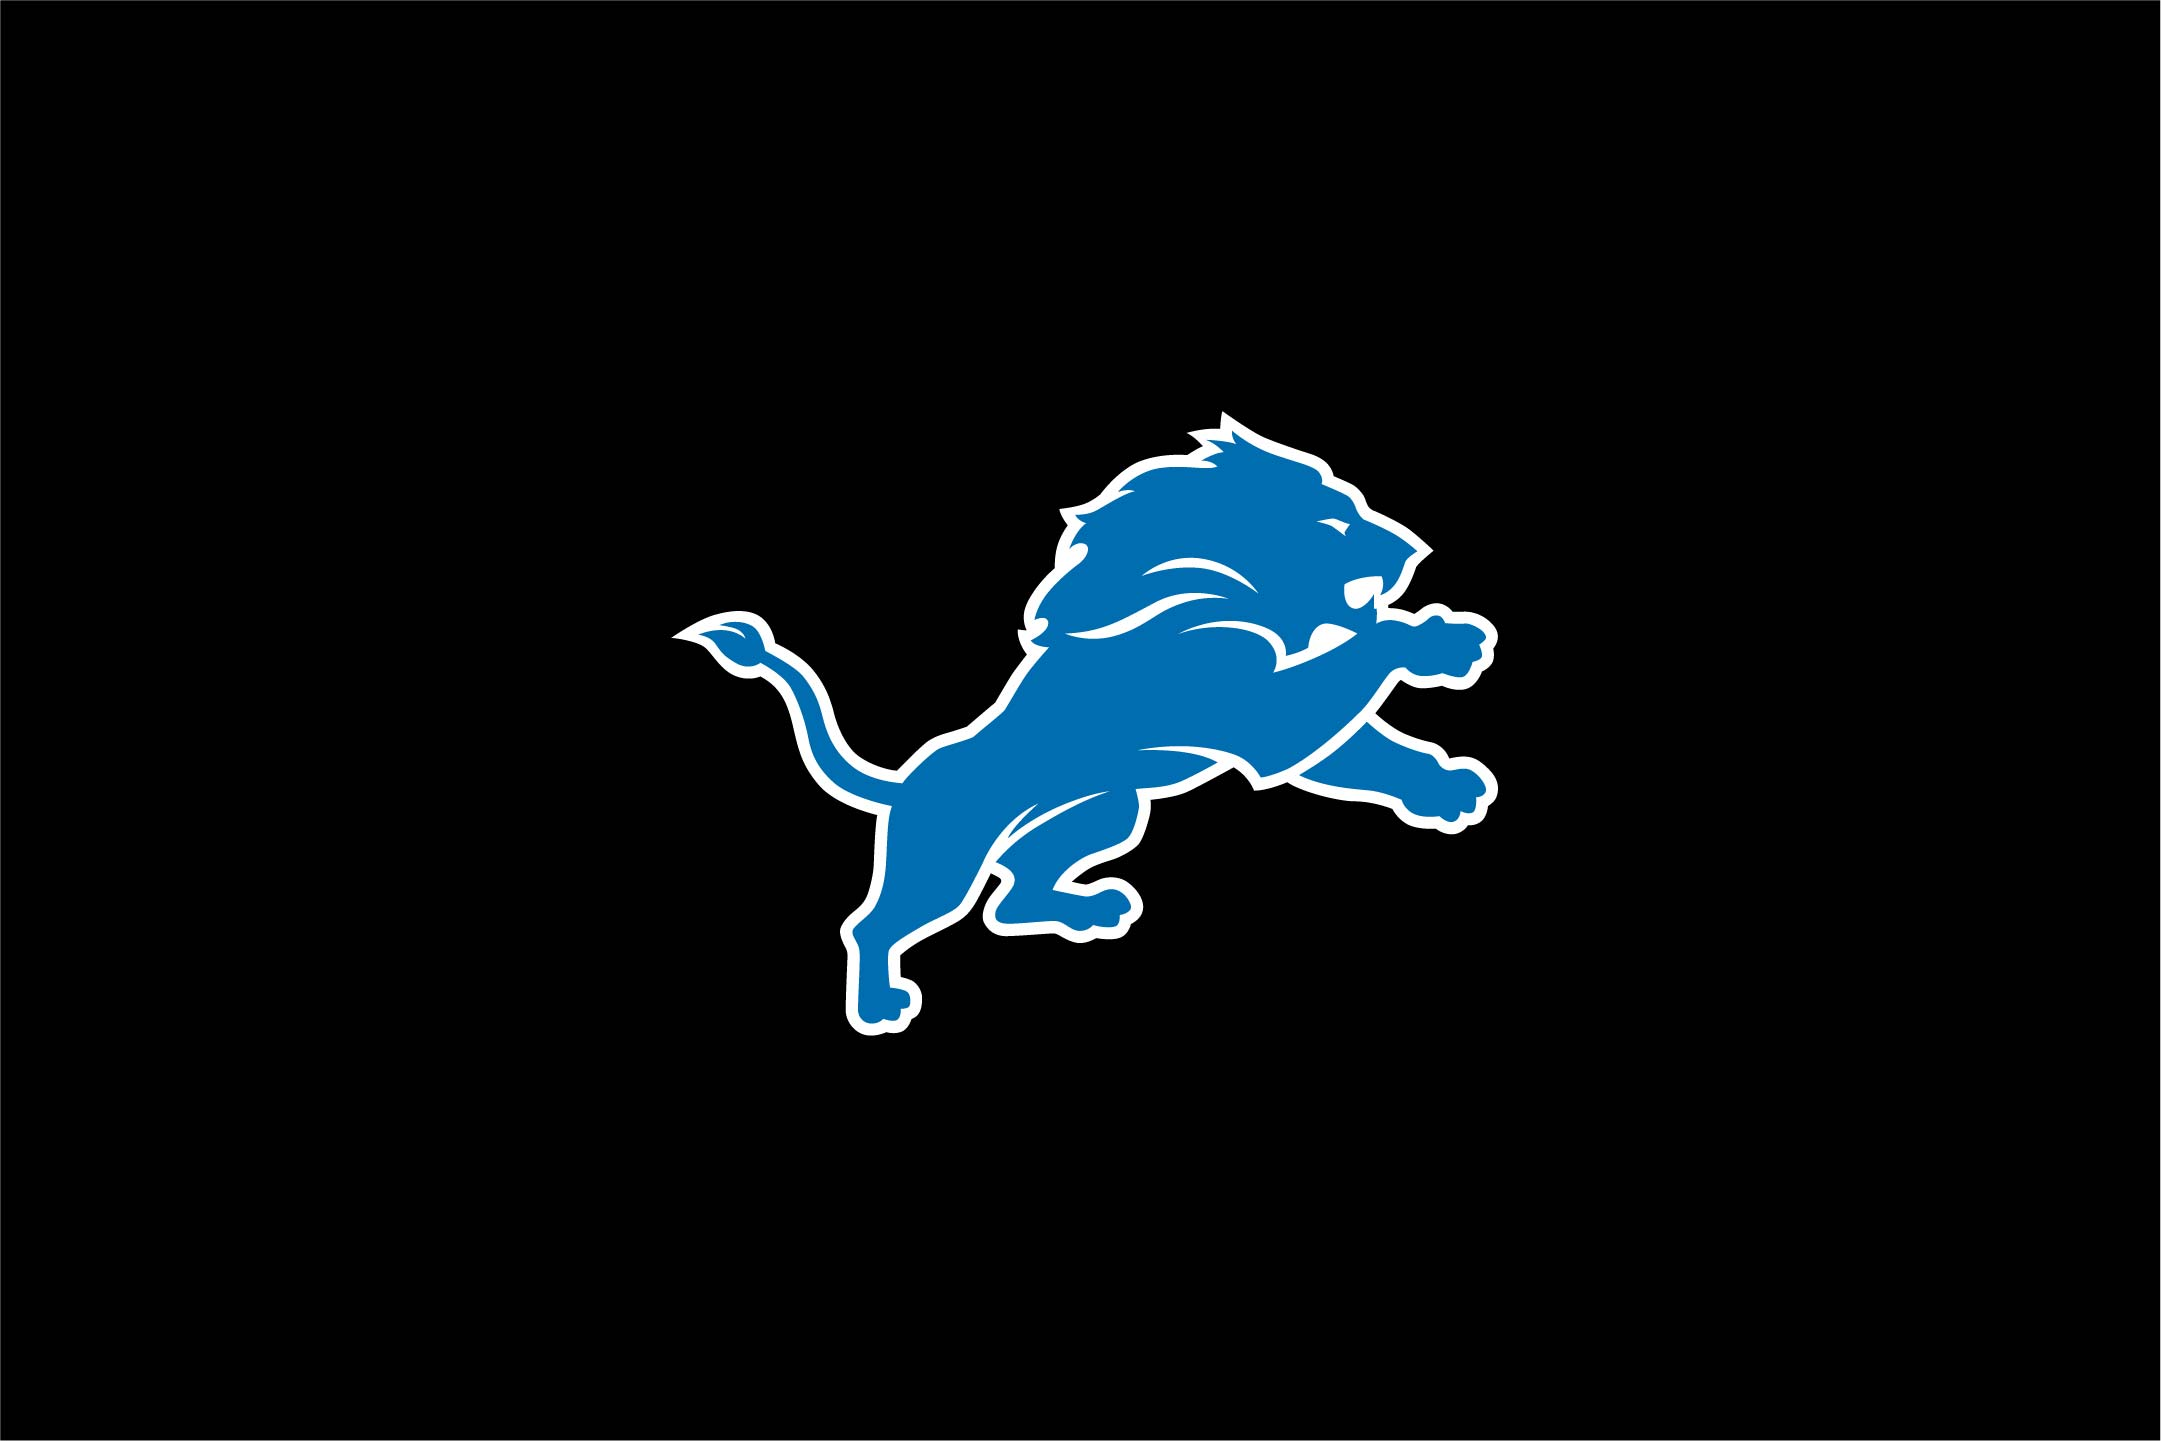 Detroit Lions Football Detroit Lions Nfl Football 2161x1441